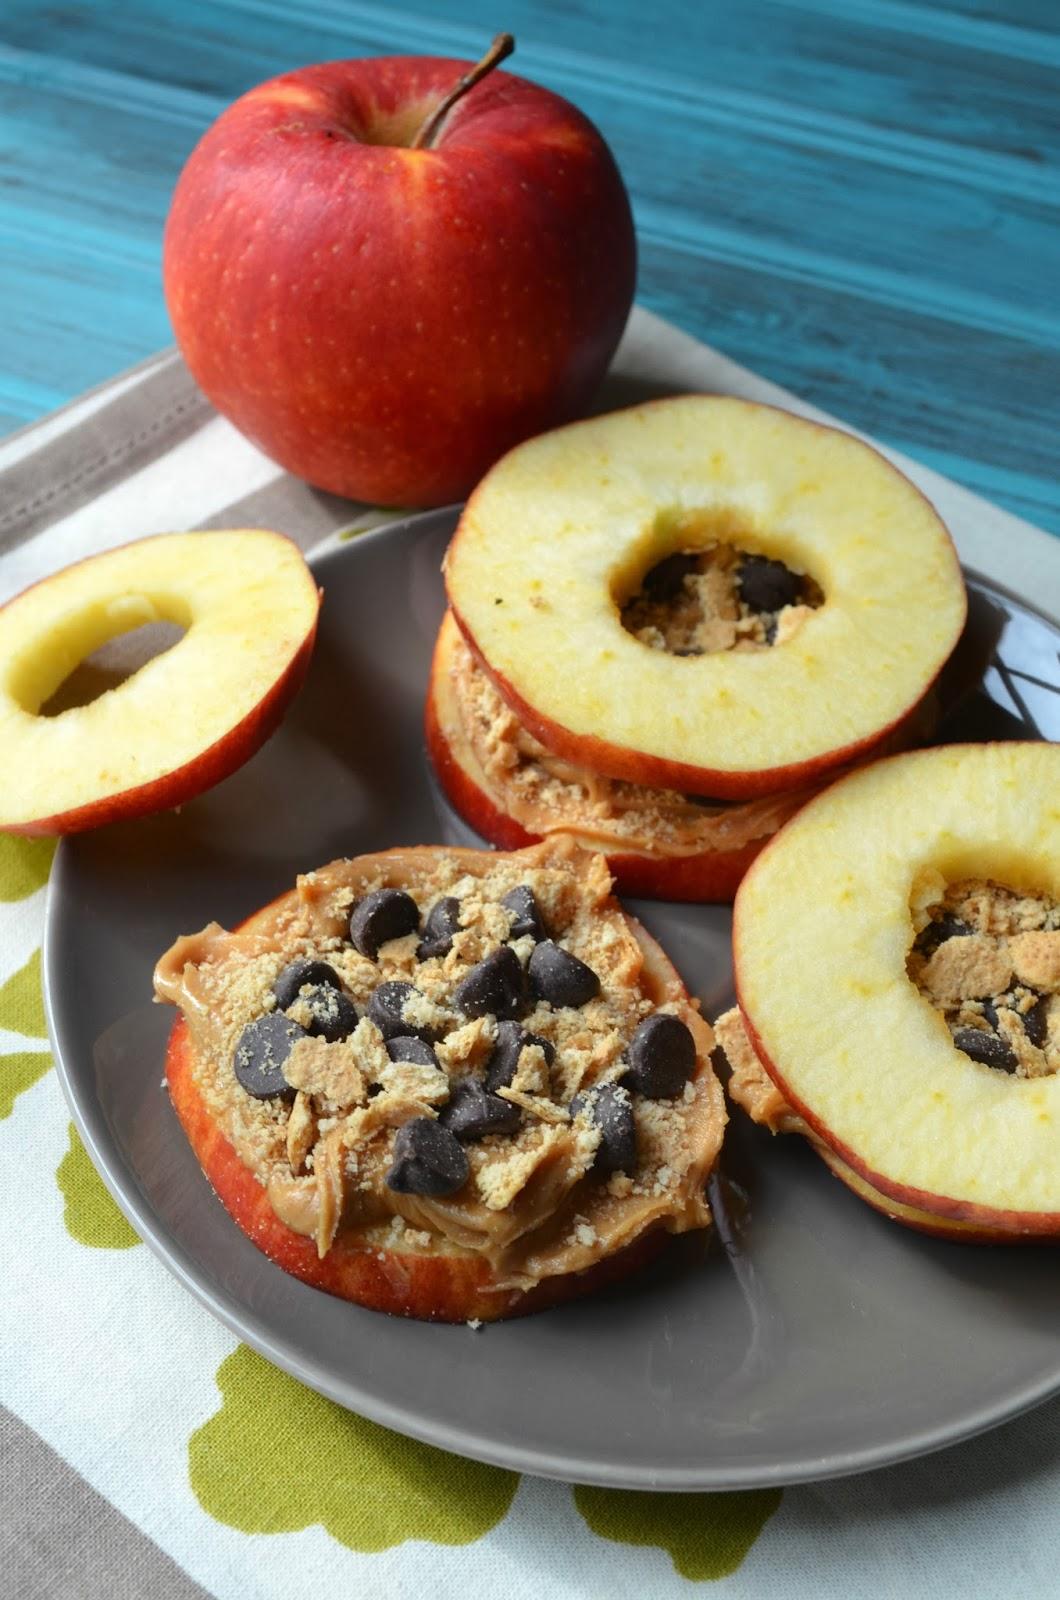 The Savvy Kitchen: Apple Snack Stacks